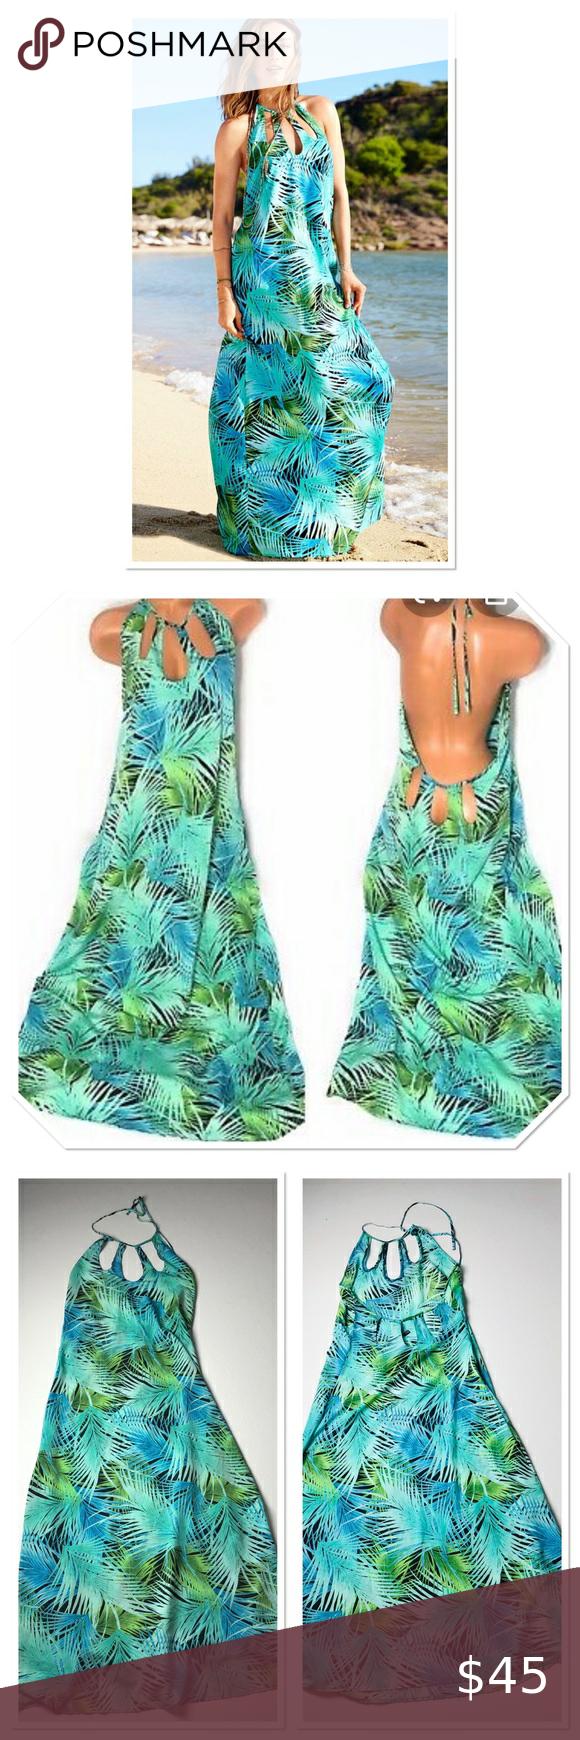 Victoria Secret Swim Cover Up Maxi Dress Size M Maxi Dress Maxi Dress Coverup Victoria Secret [ 1740 x 580 Pixel ]